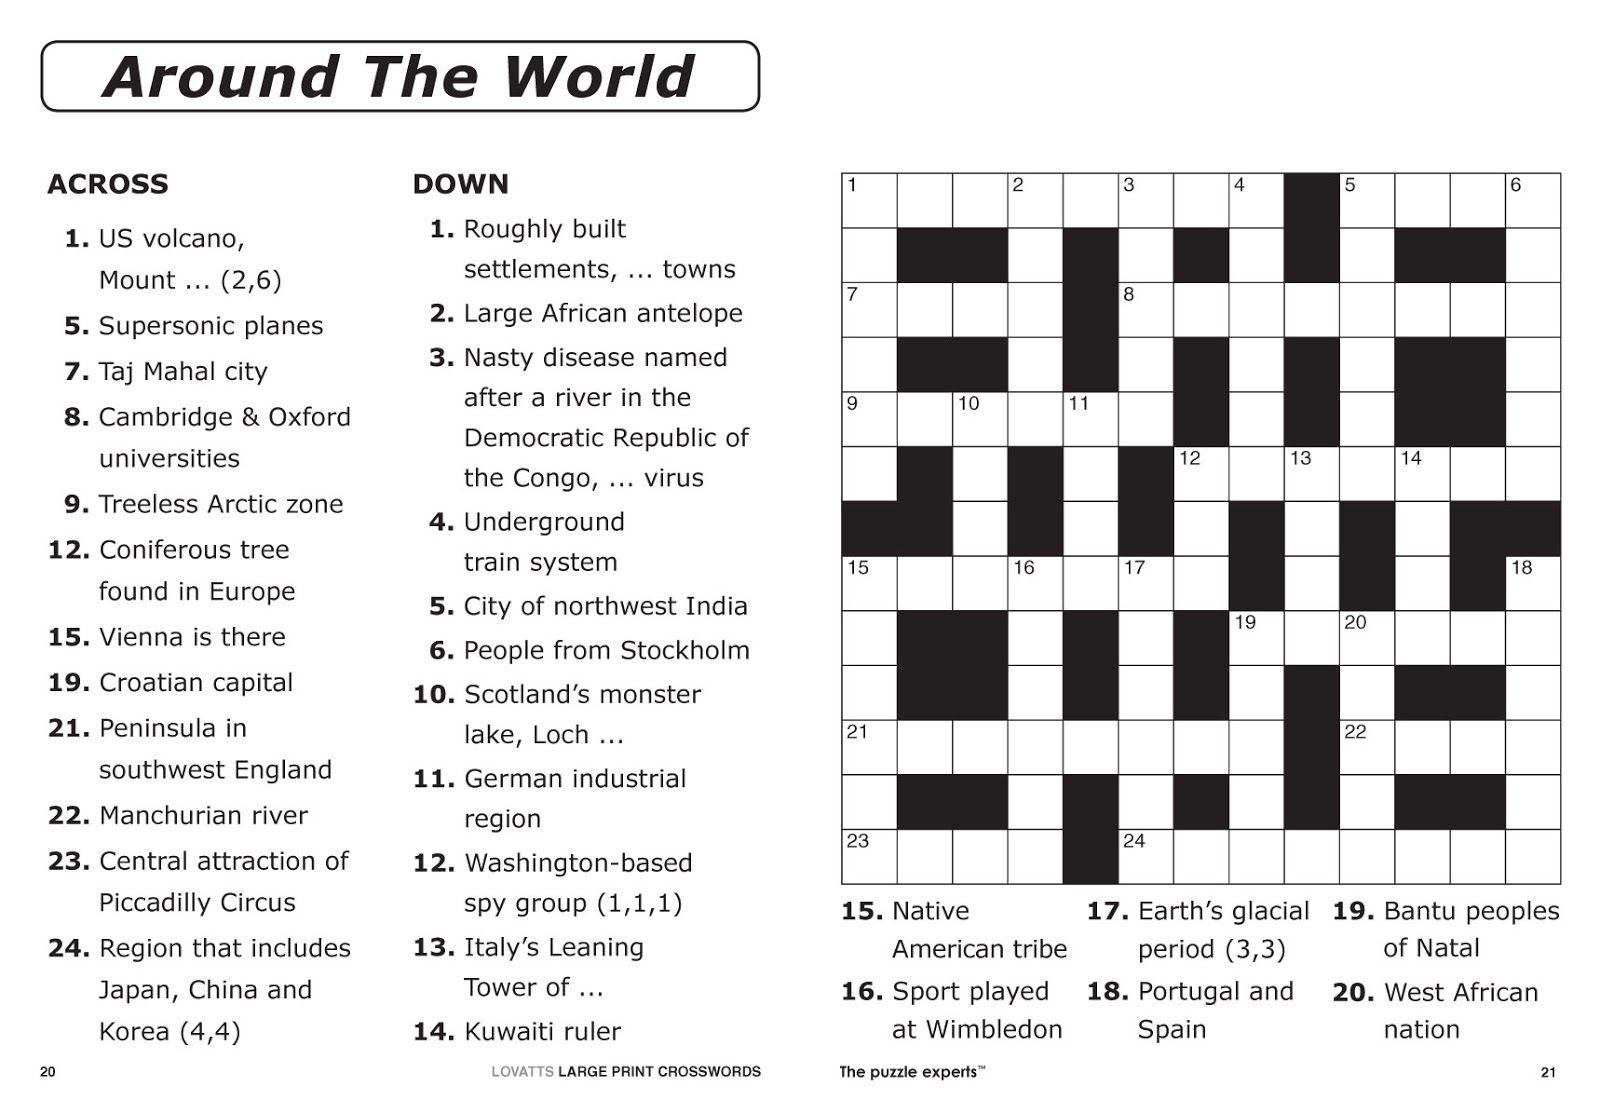 Free Printable Large Print Crossword Puzzles | M3U8 - Printable Crossword Puzzle For 8 Year Old